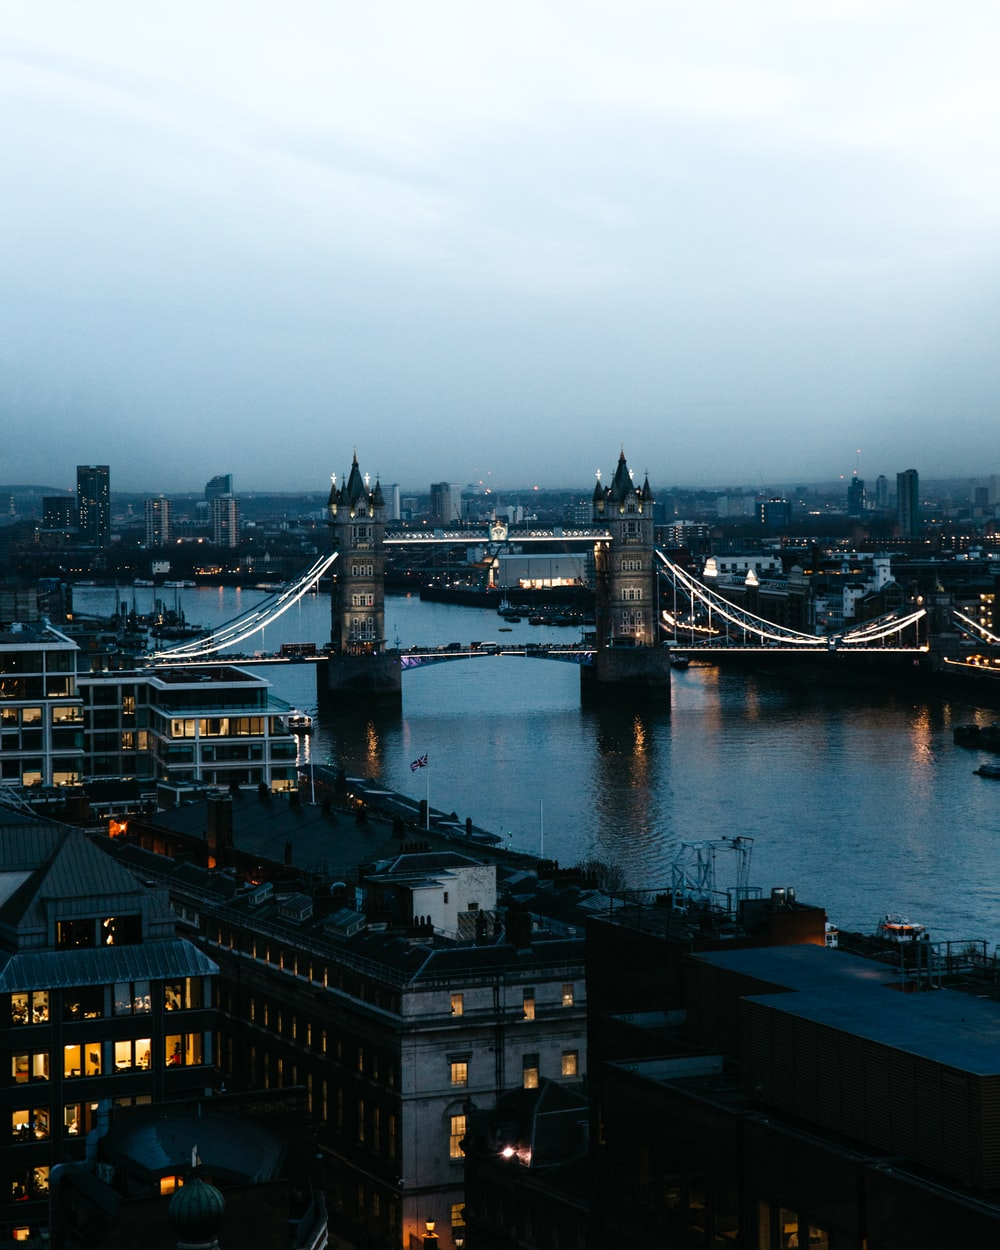 view of Tower Bridge under white skies